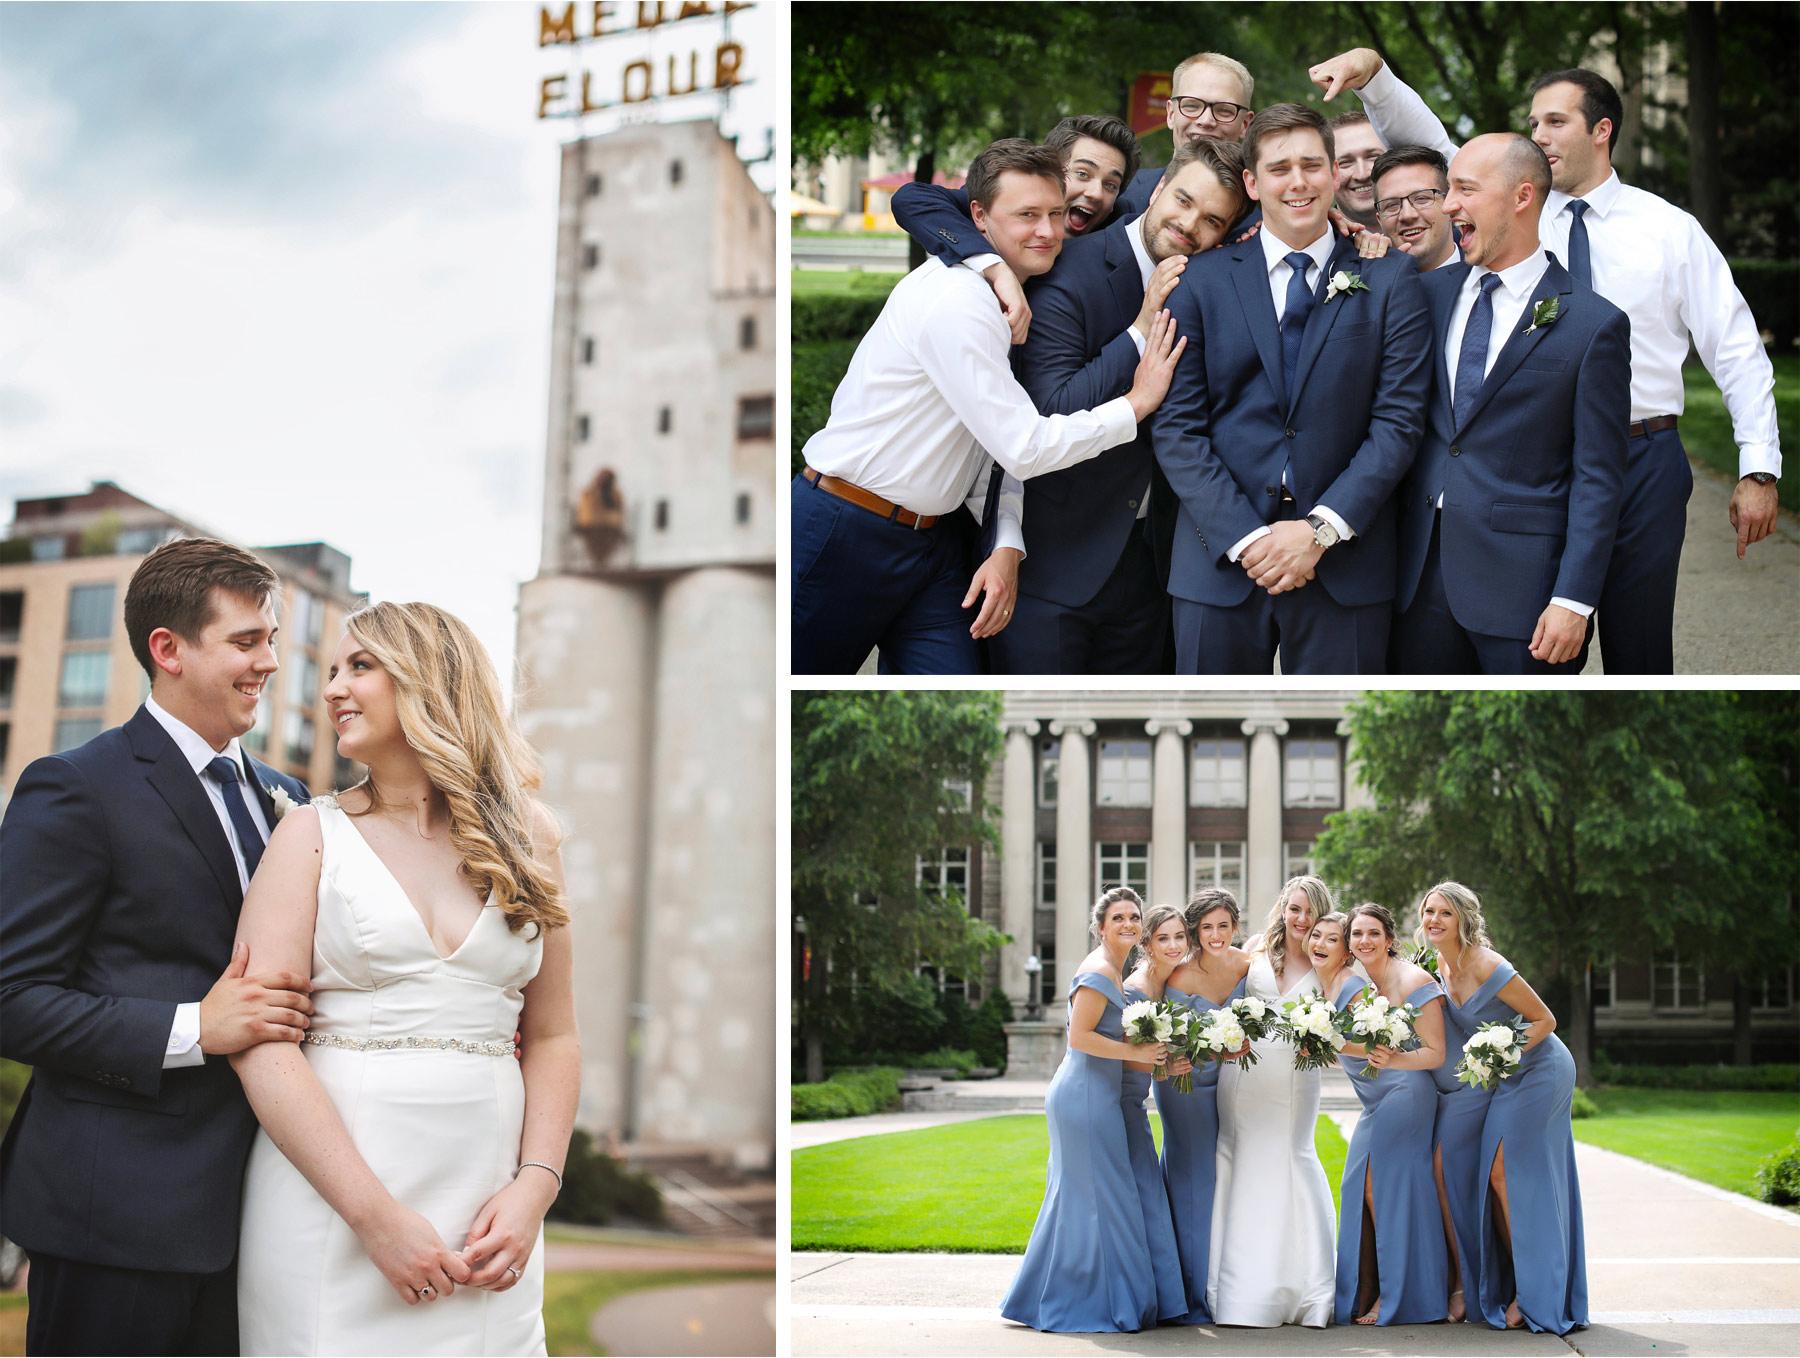 12-Minneapolis-Minnesota-Wedding-Vick-Photography-The-Depot-Bridesmaids-Groomsmen-Amelia-and-Alexander.jpg